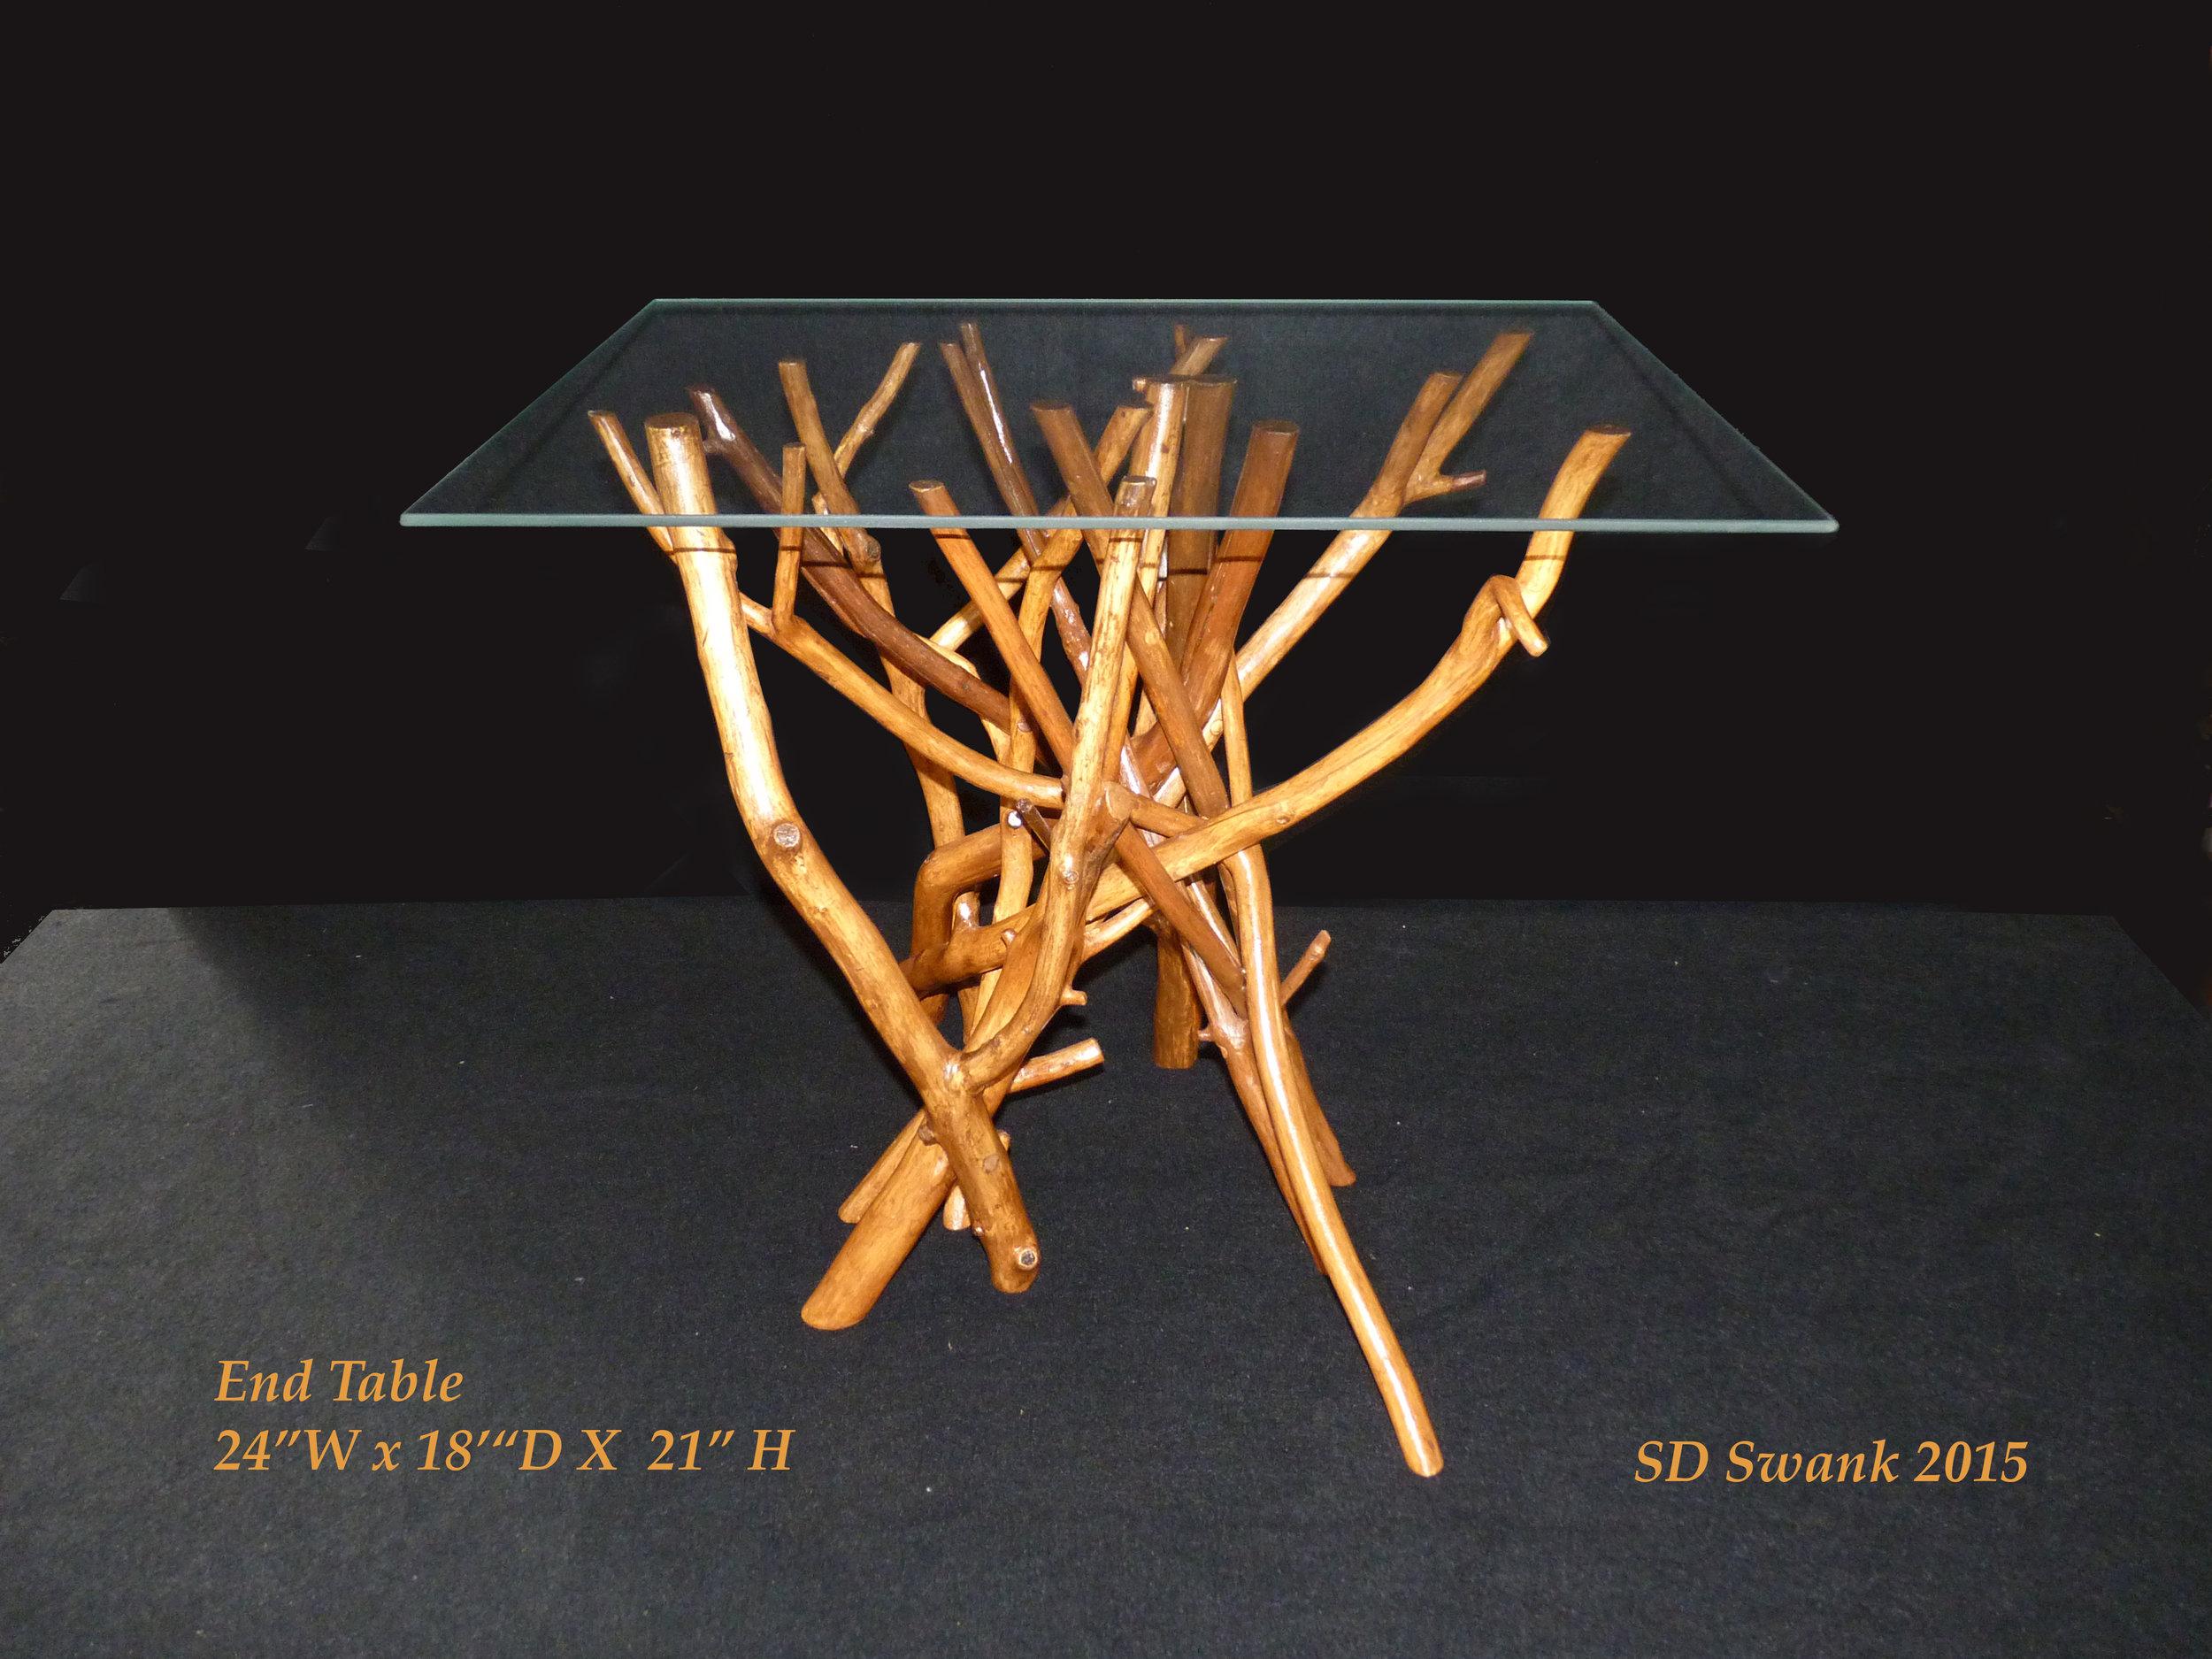 End Table copy.jpg